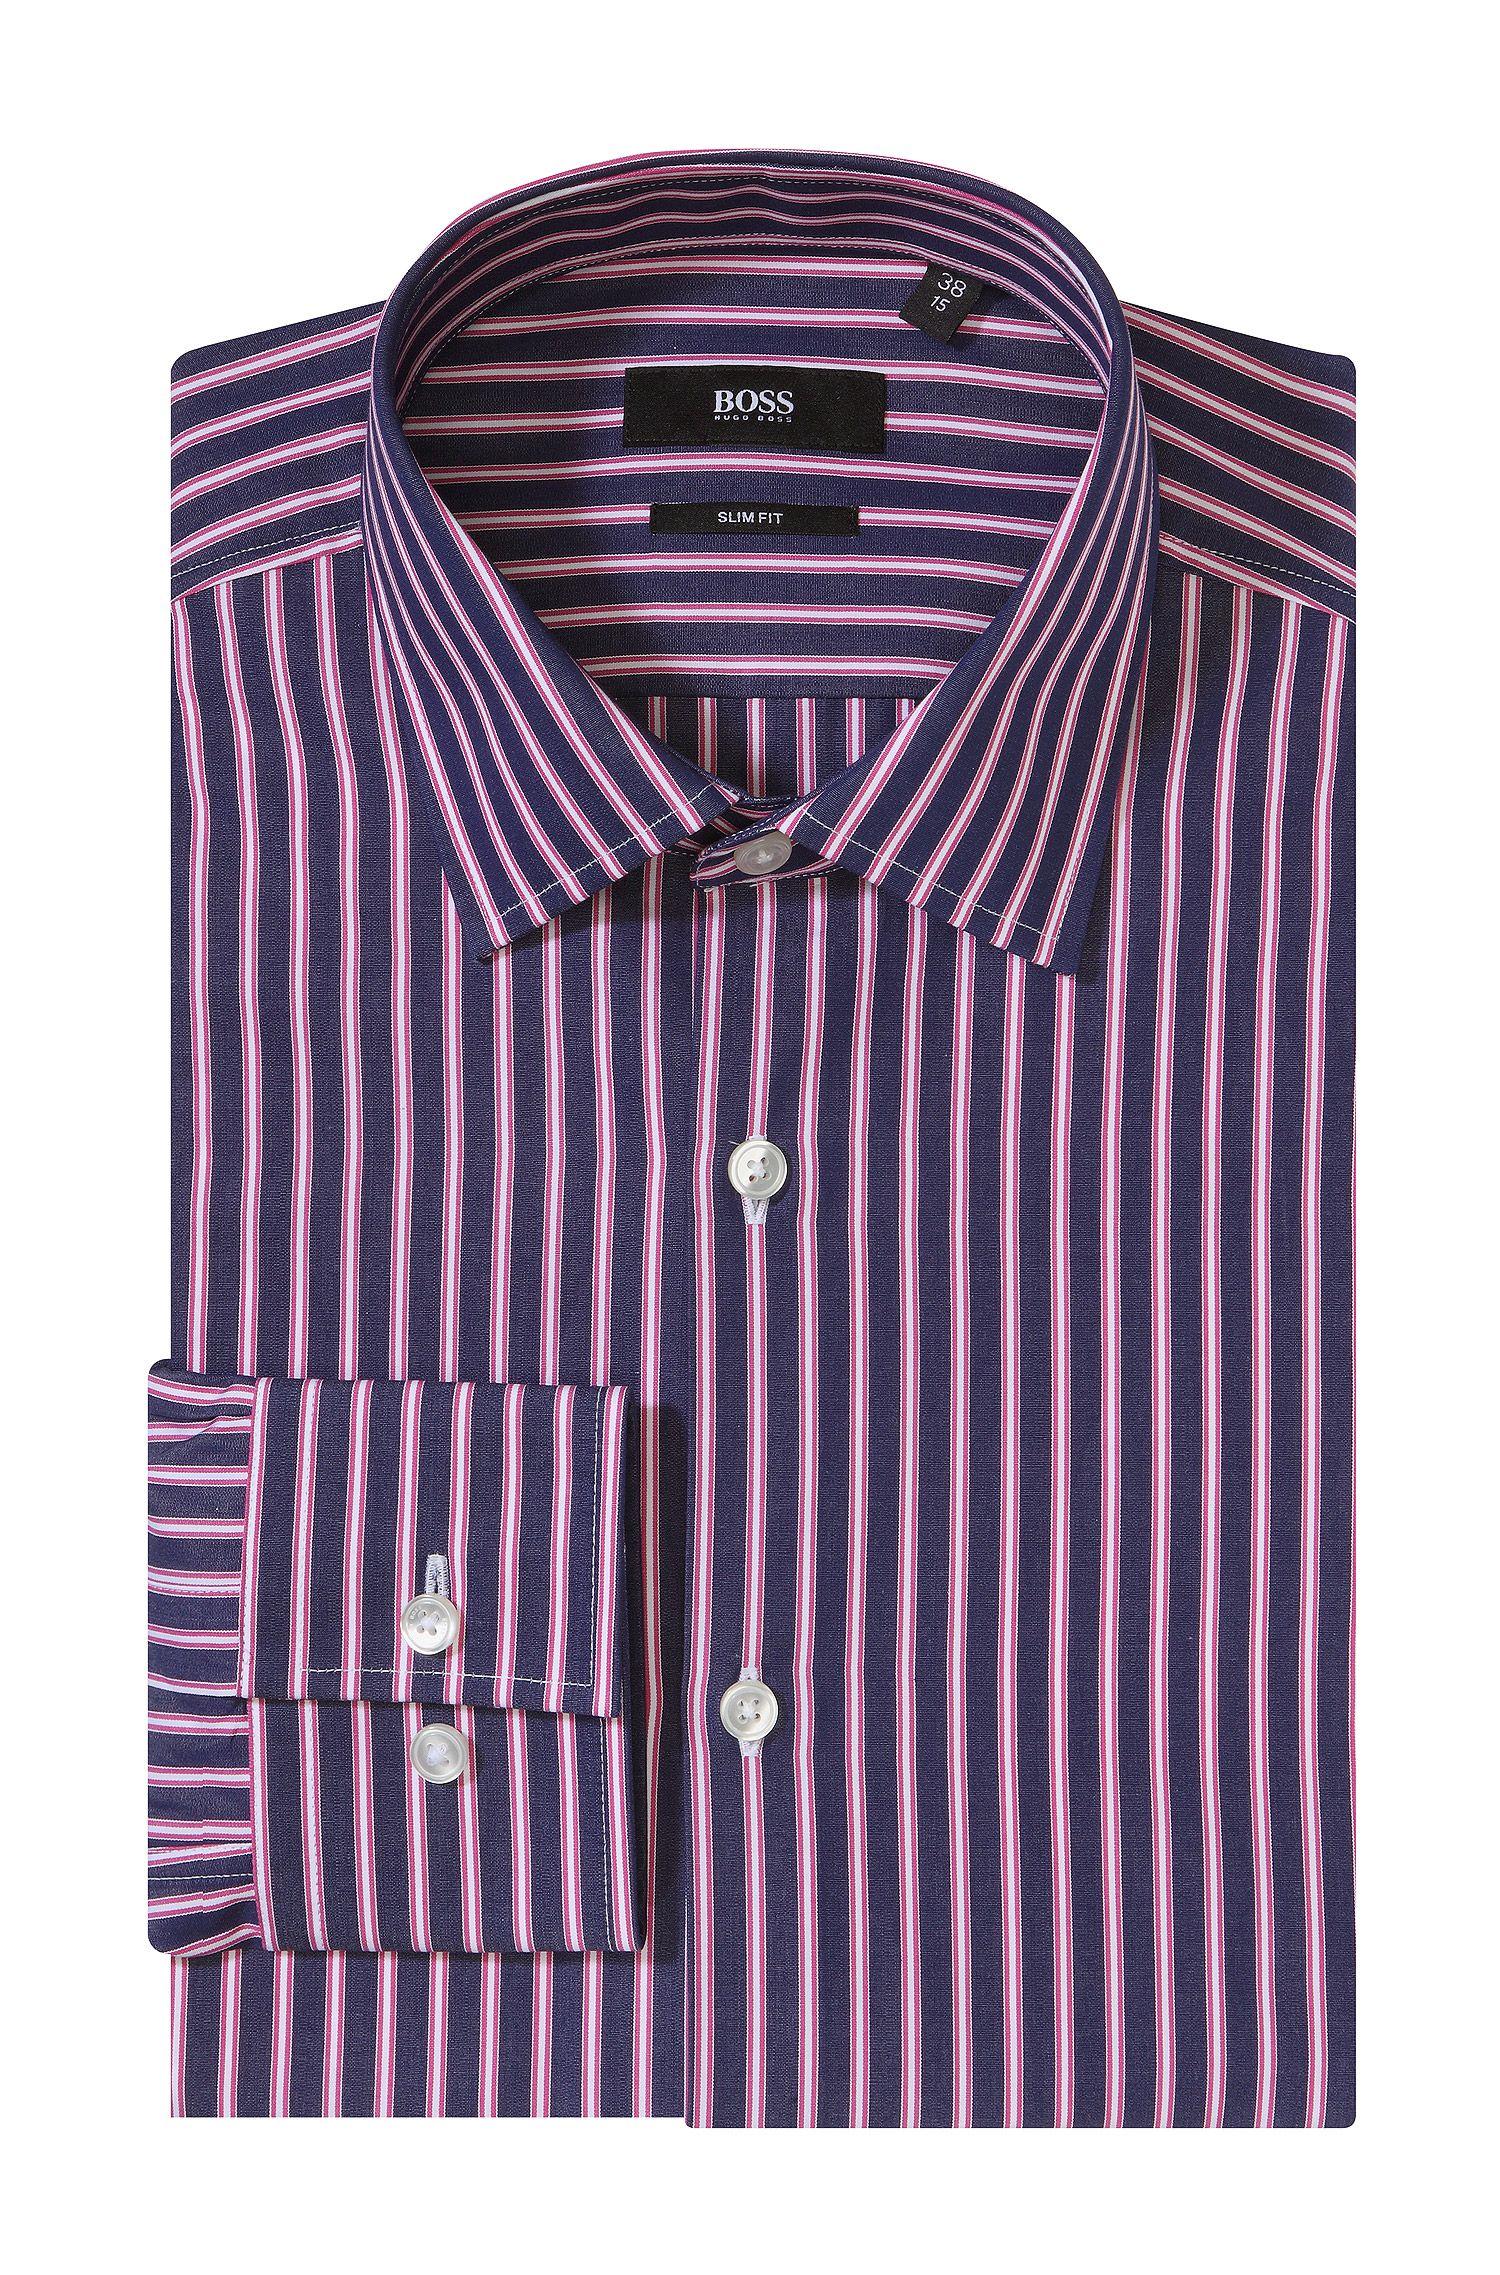 Business-Hemd ´Jenno` mit schmalem Kentkragen